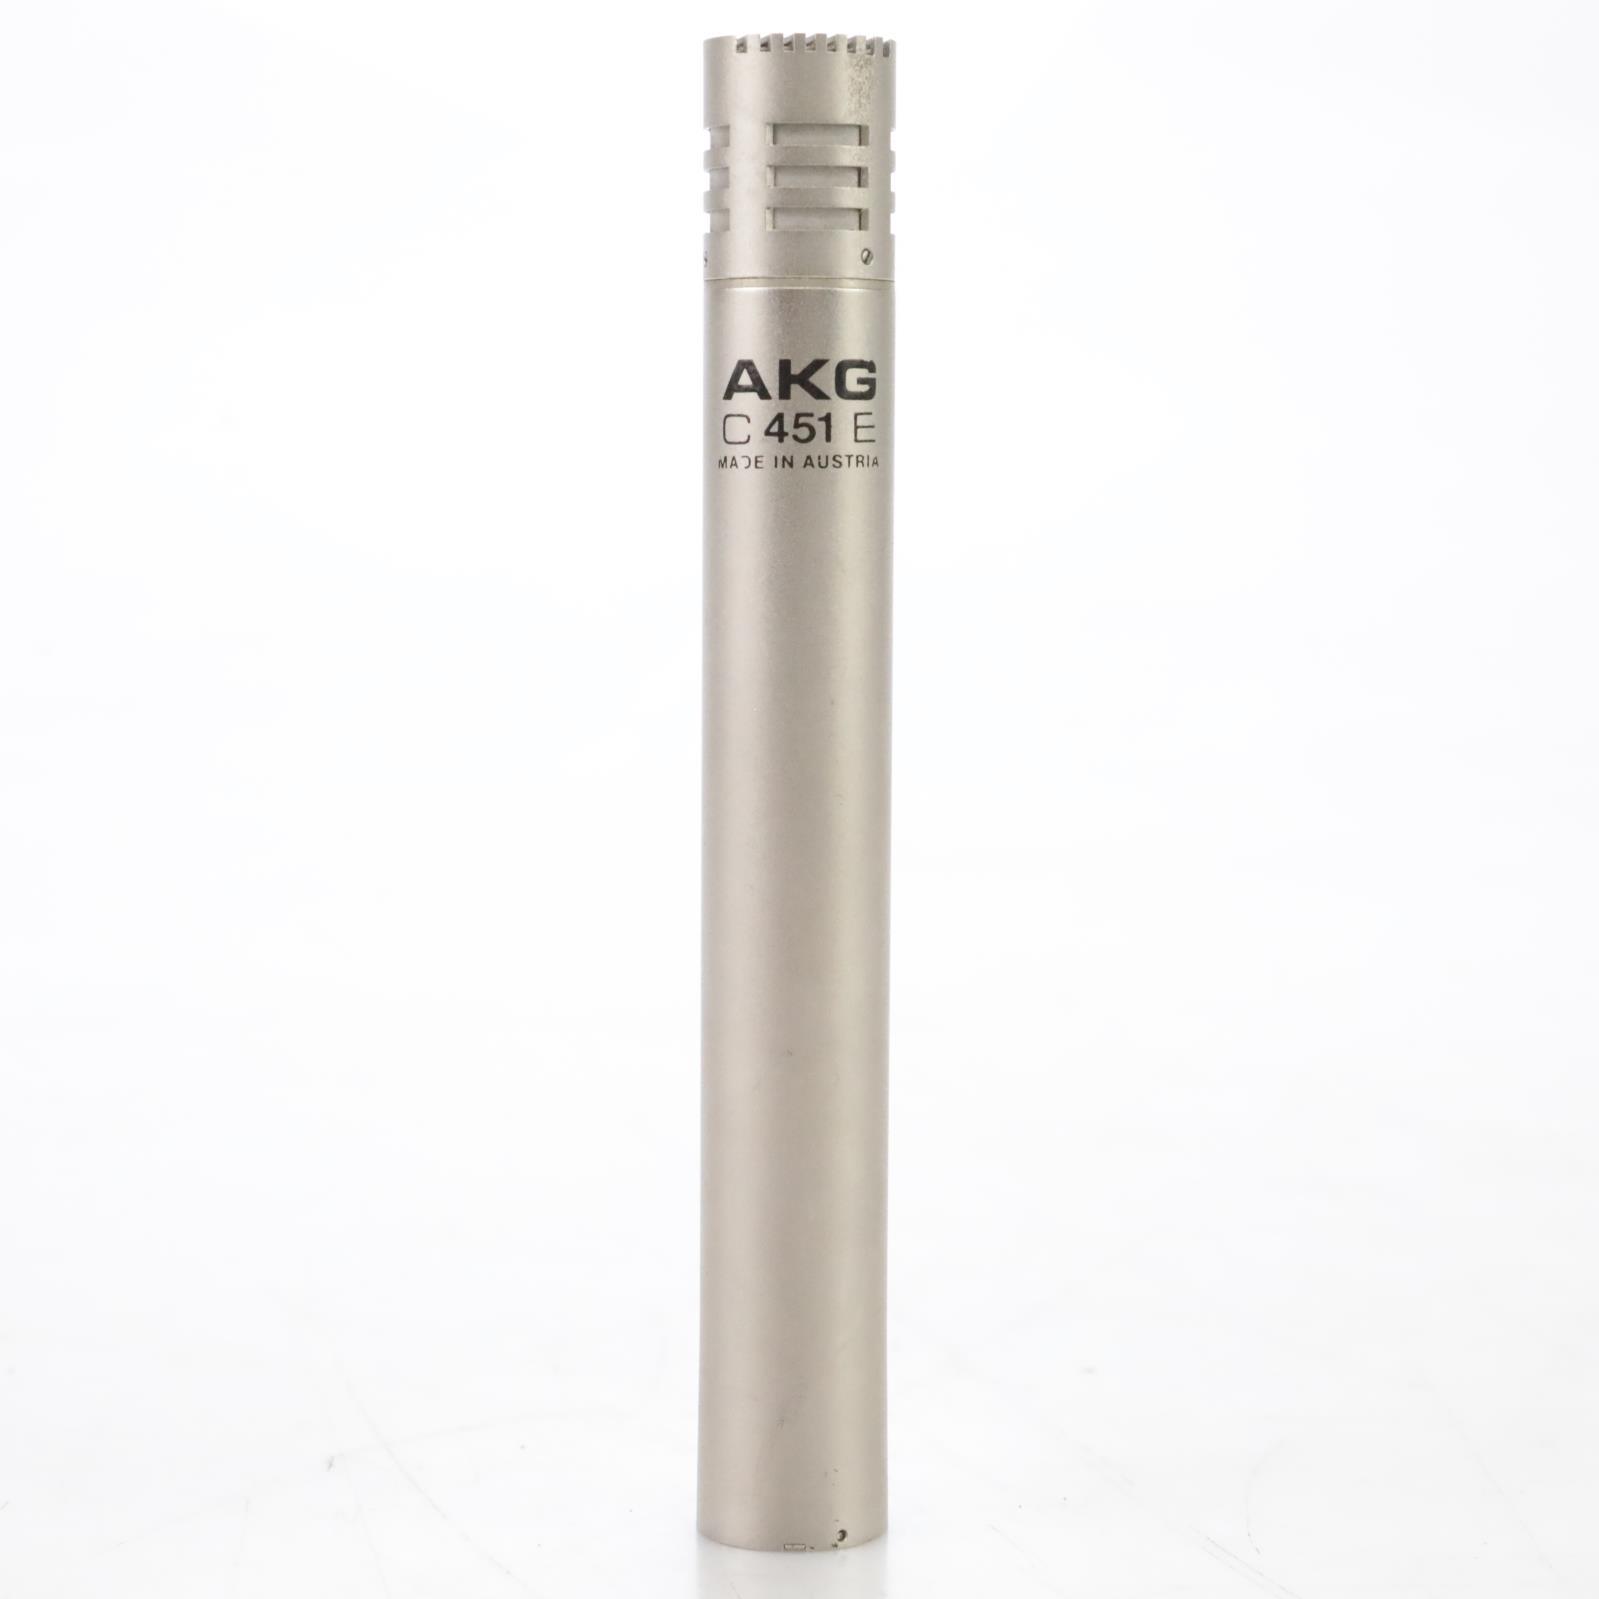 AKG C 451 E Condensor Microphone & Shure A15RS Response Filter C451E #45062